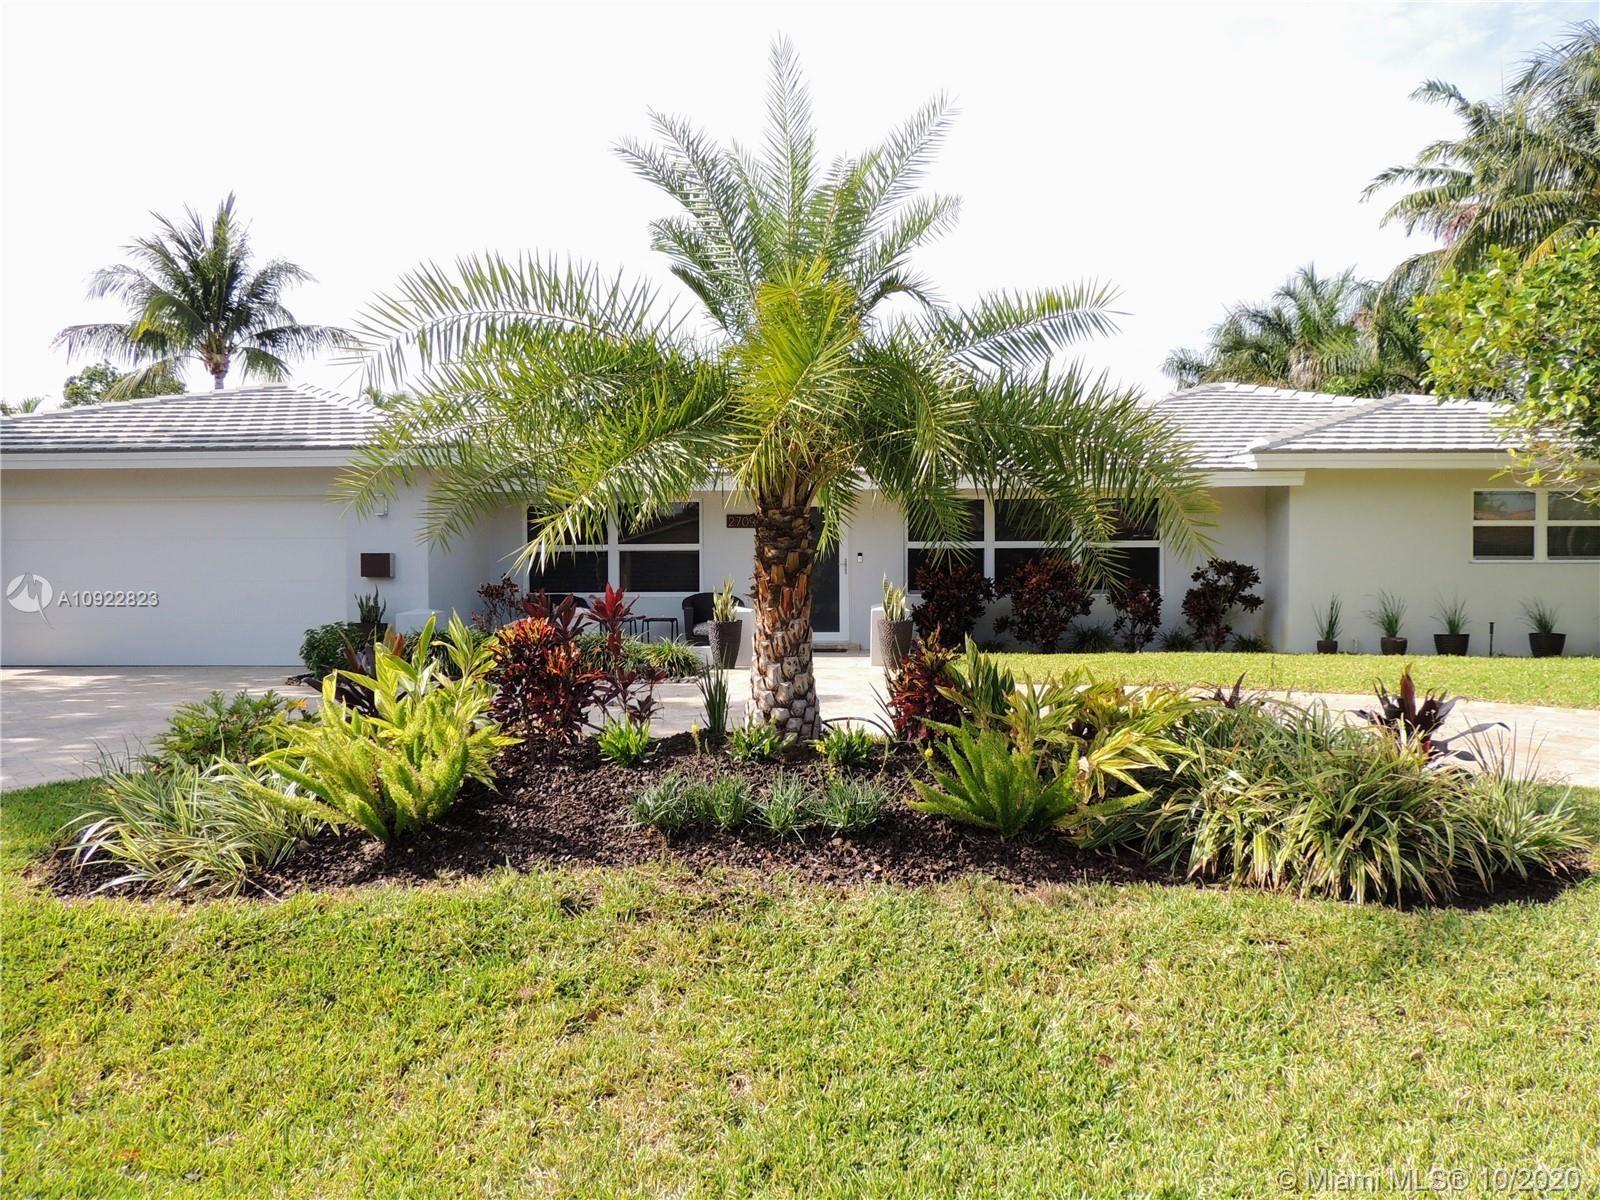 2709 NE 33rd St, Fort Lauderdale, FL 33306 - #: A10922823